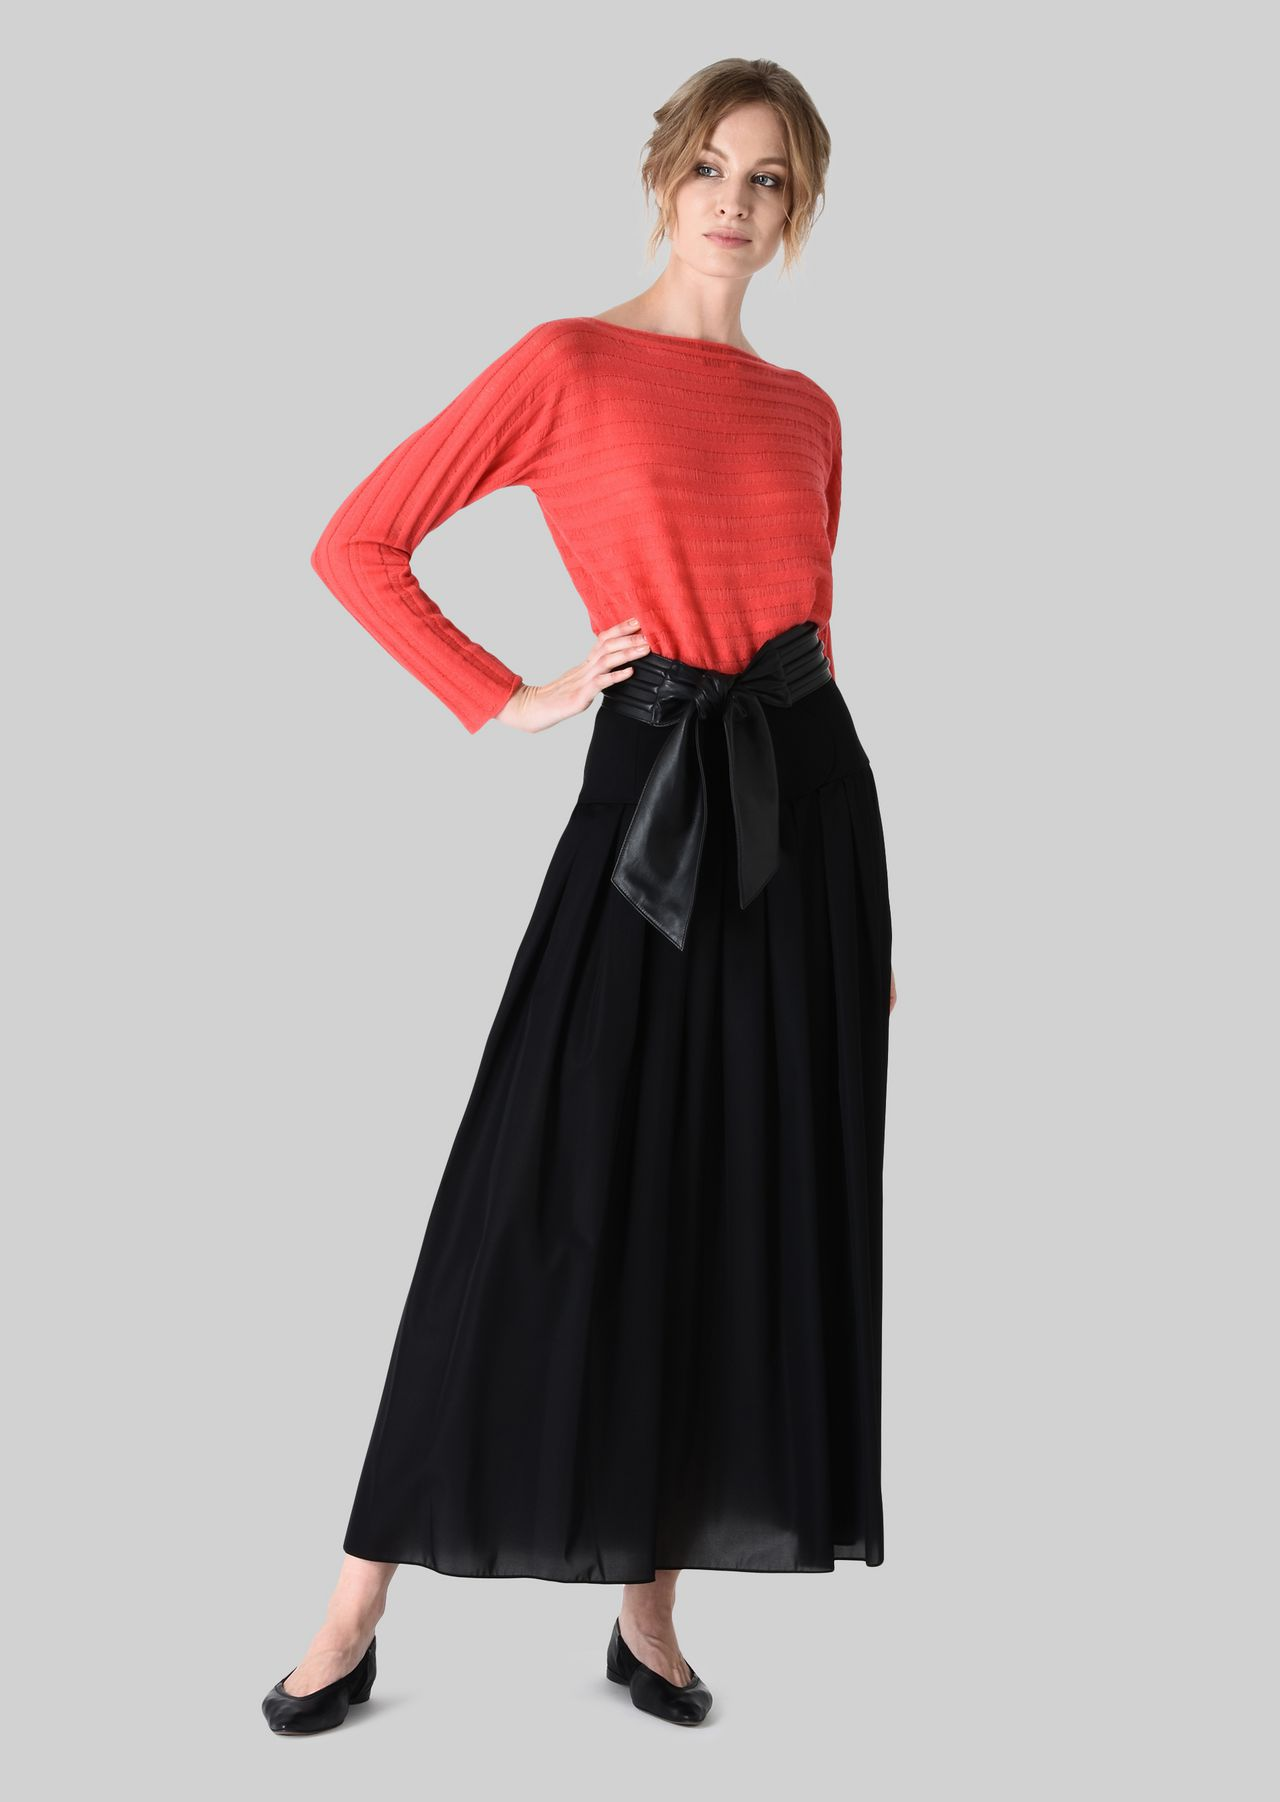 LONG SKIRT IN TECHNICAL CRÊPE DE CHINE.: Skirts Women by Armani - 0